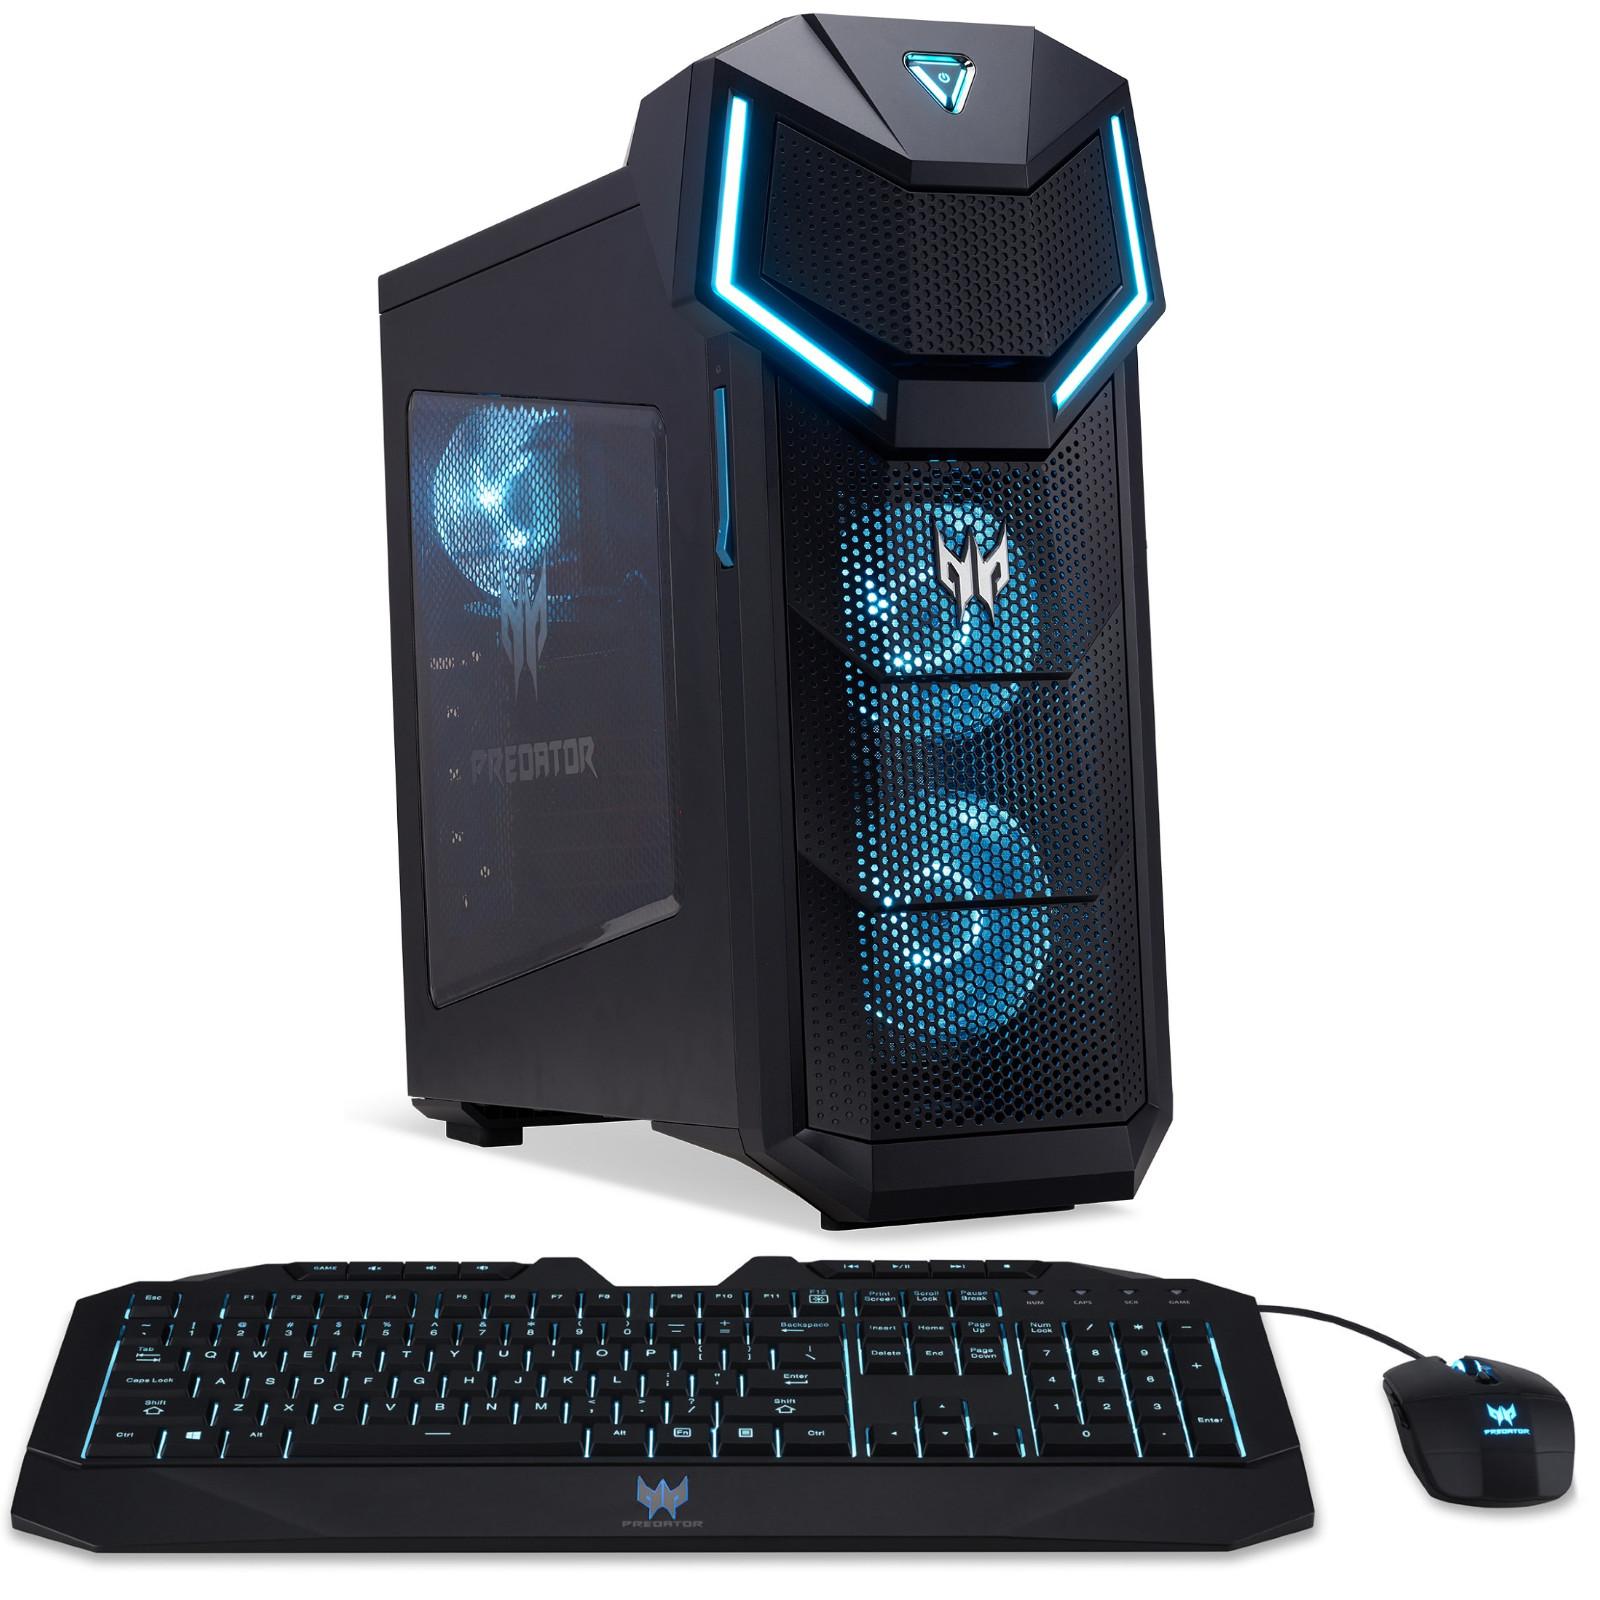 b5845e4d696 Buy the Acer Predator Orion 5000 RTX 2080 Gaming PC Intel i7 8700K 6 ...